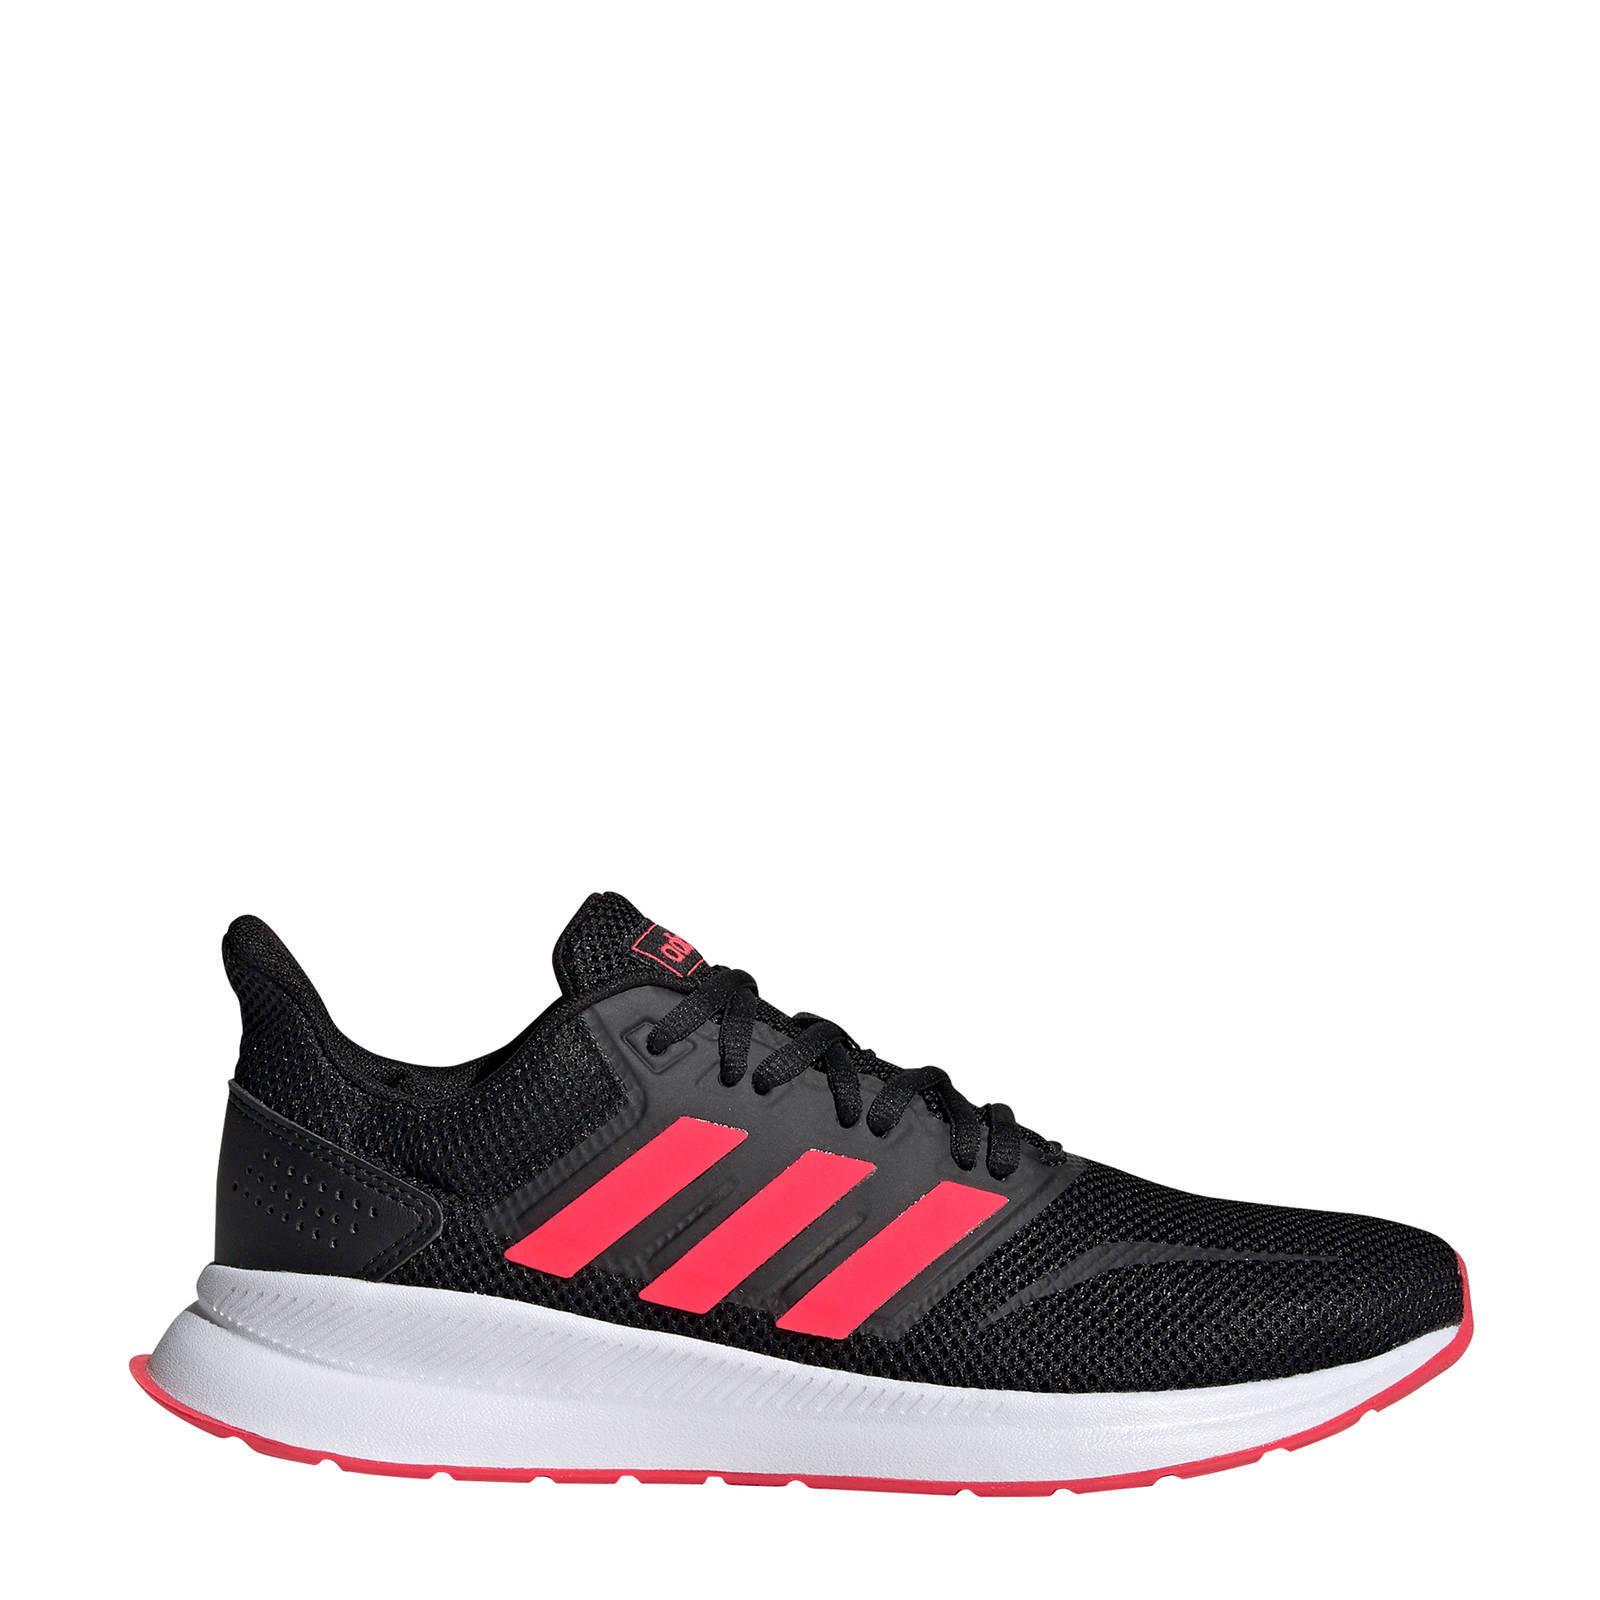 ▷ Adidas schoenen roze kopen?   Online Internetwinkel